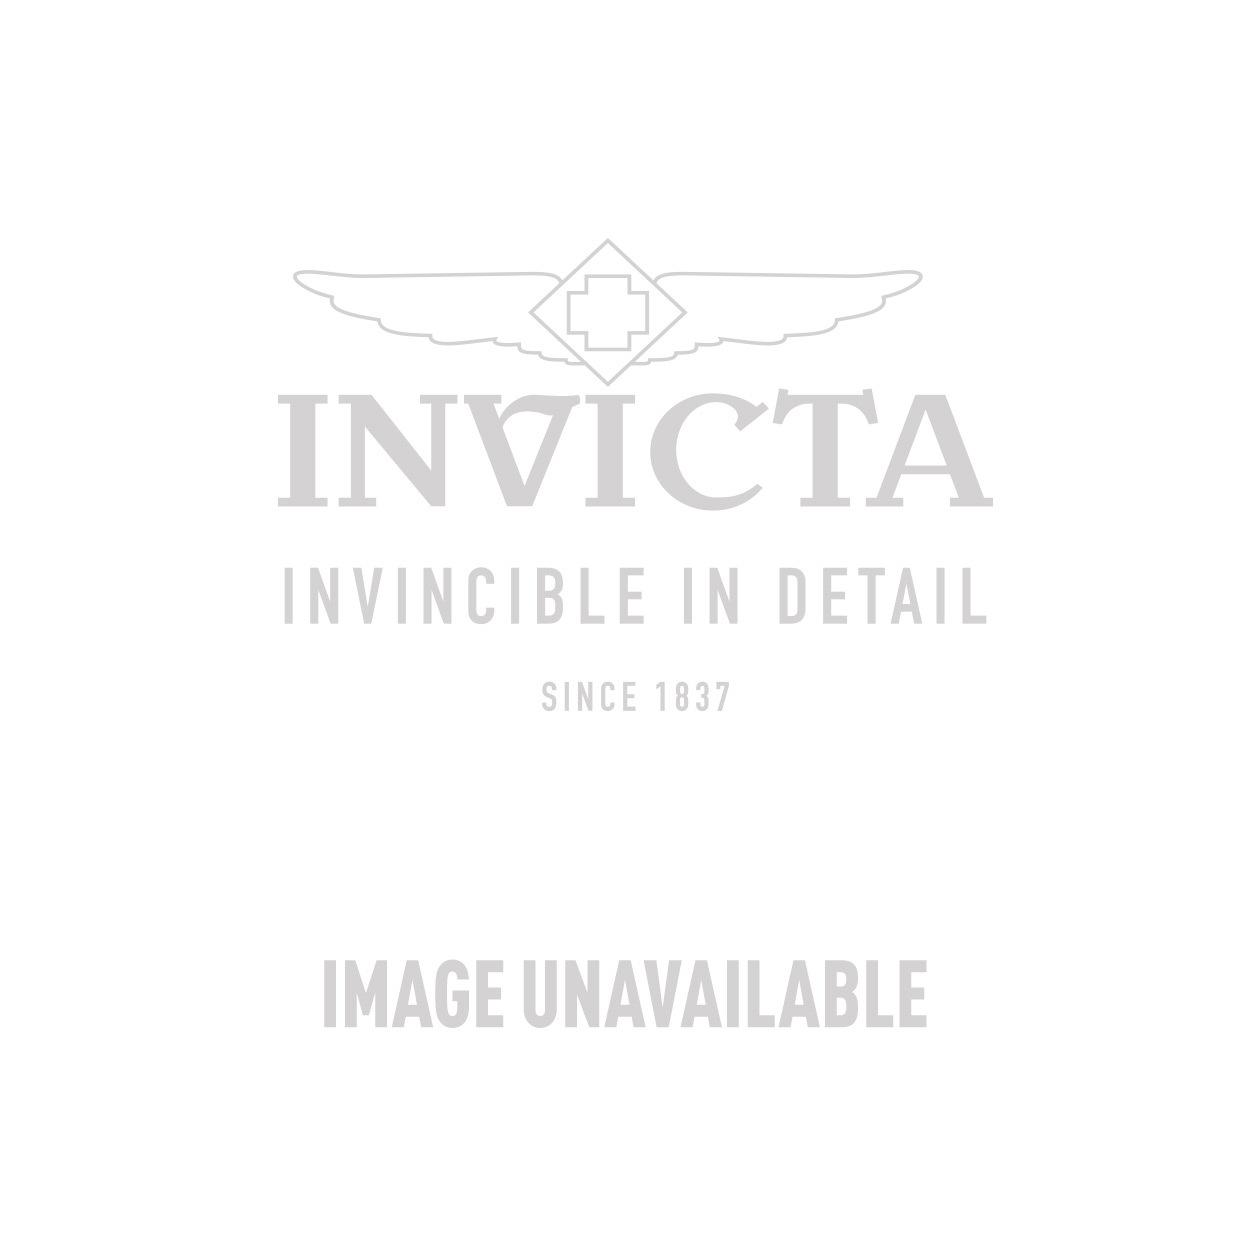 Invicta Sea Base Swiss Made Quartz Watch - Rose Gold, Black case with Black tone Polyurethane band - Model 17538